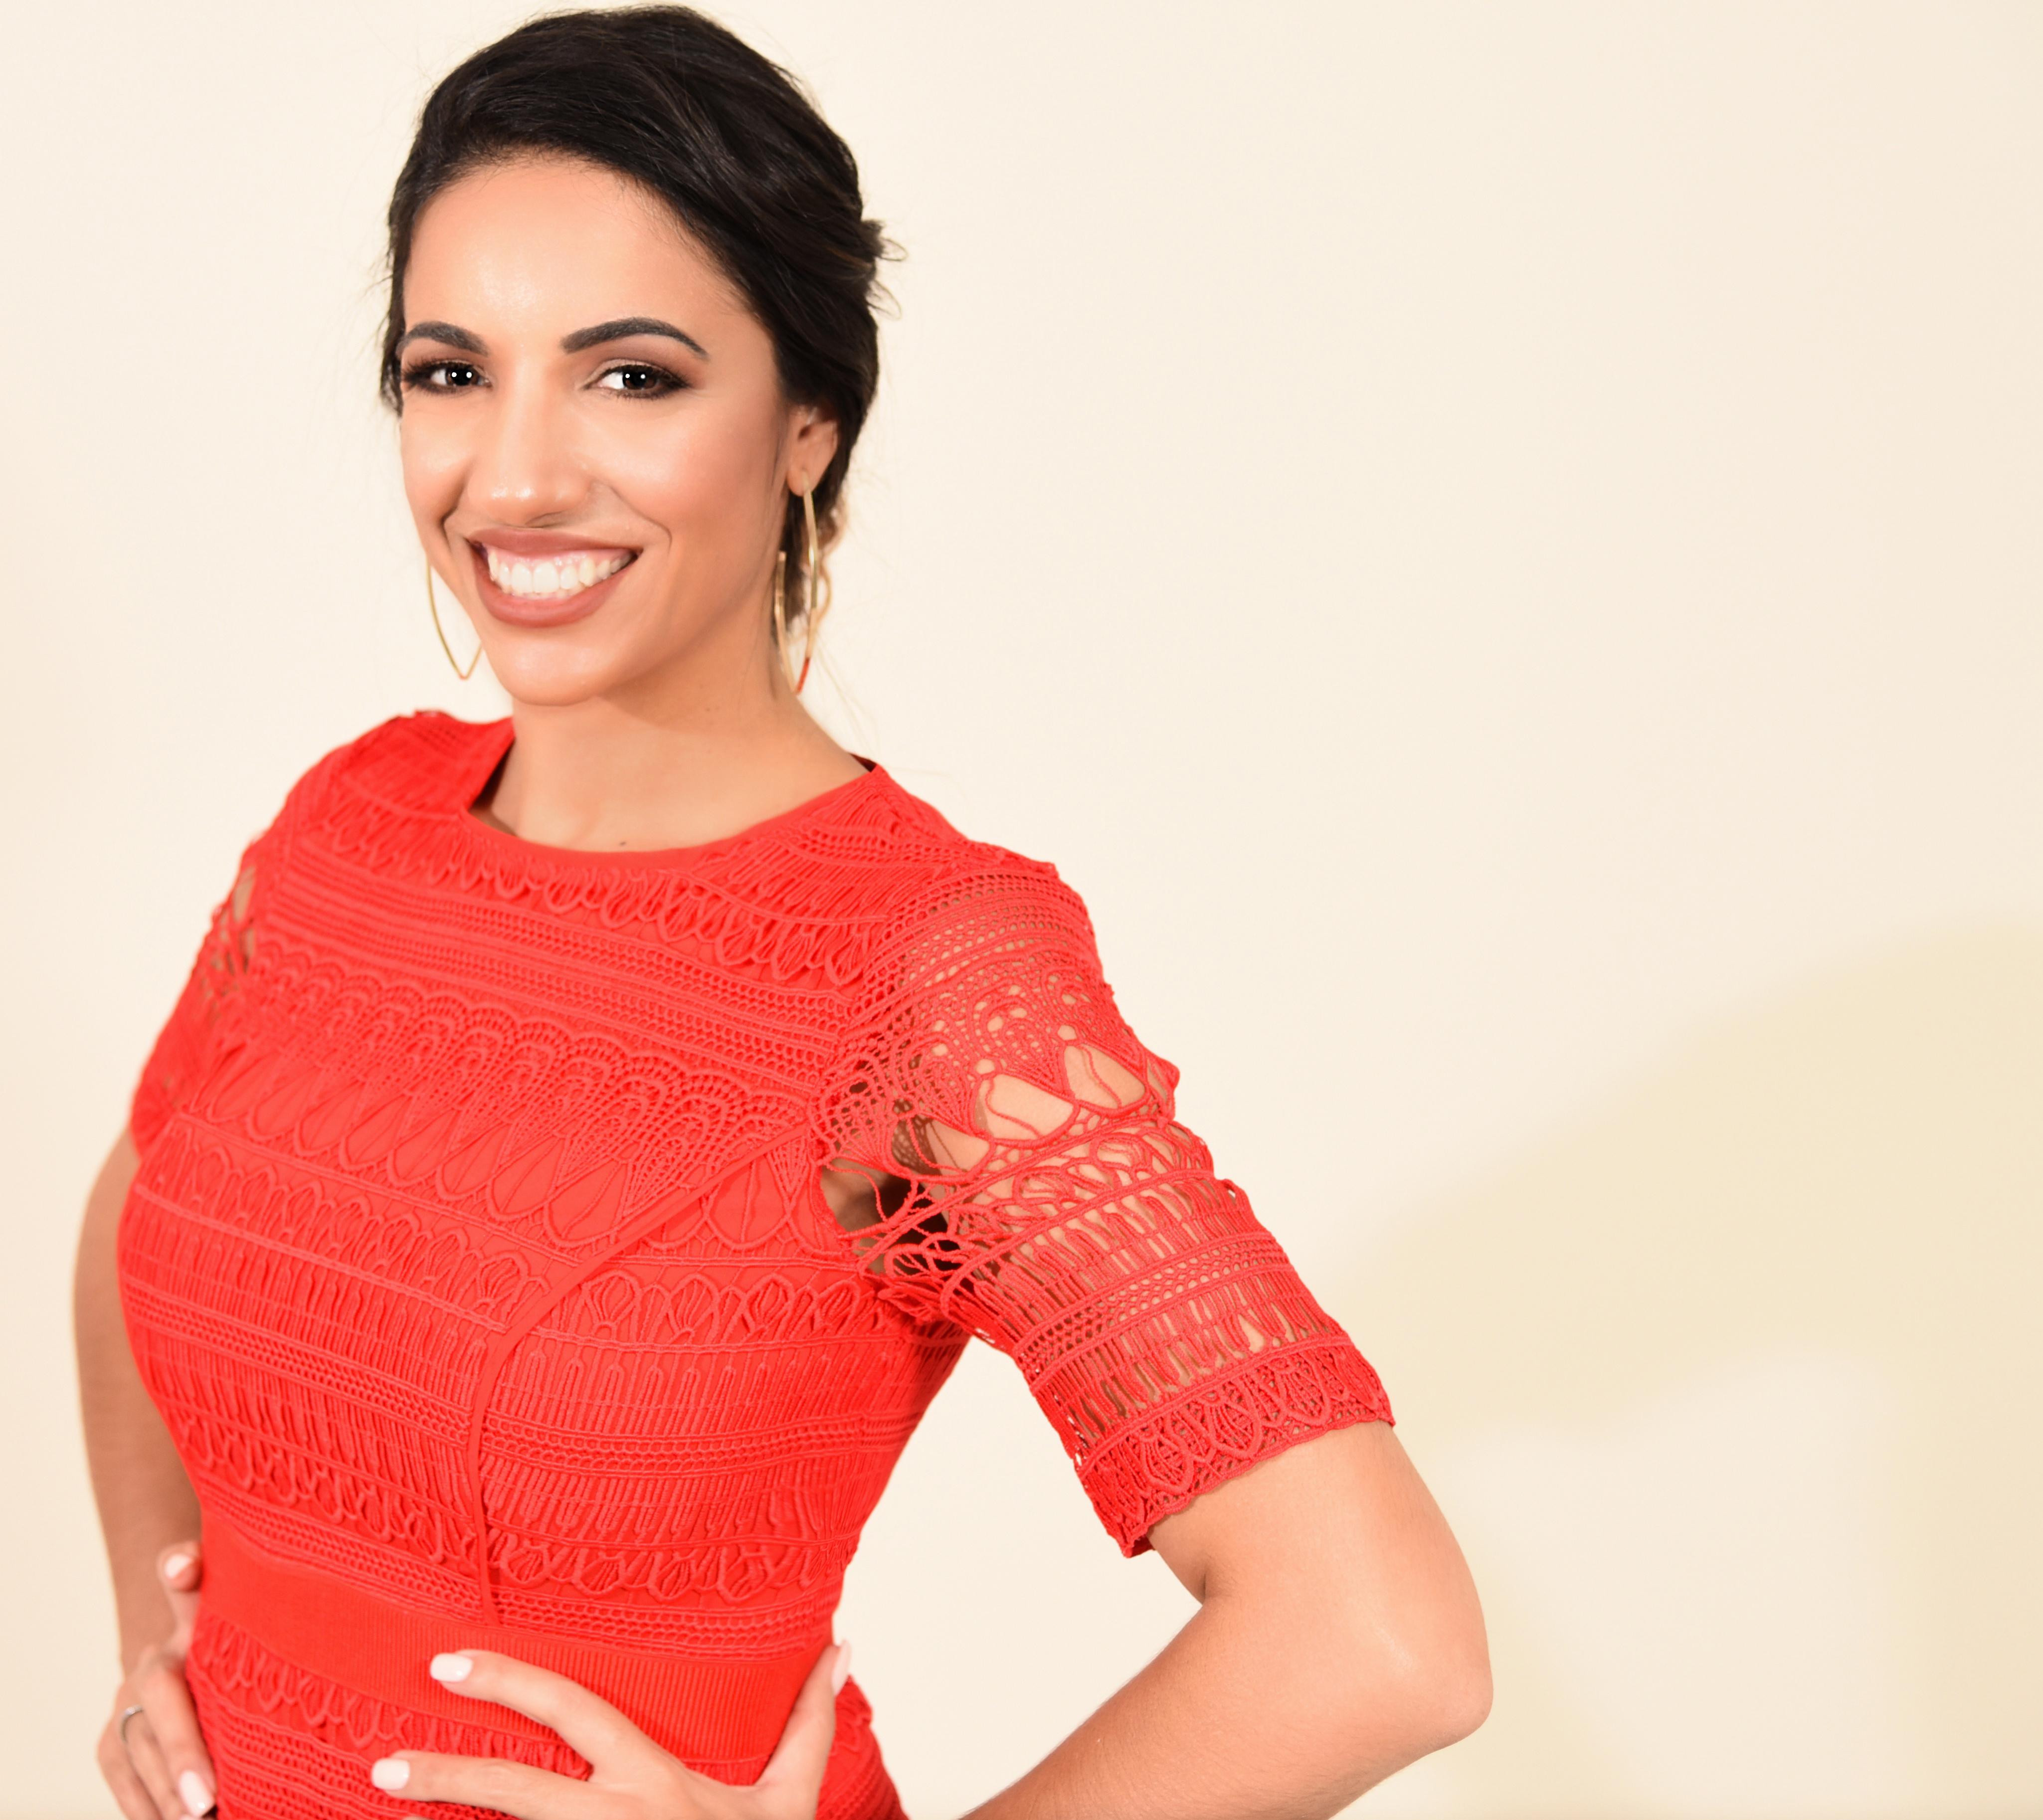 Claudia Cañizares - Poderosas - April 2019